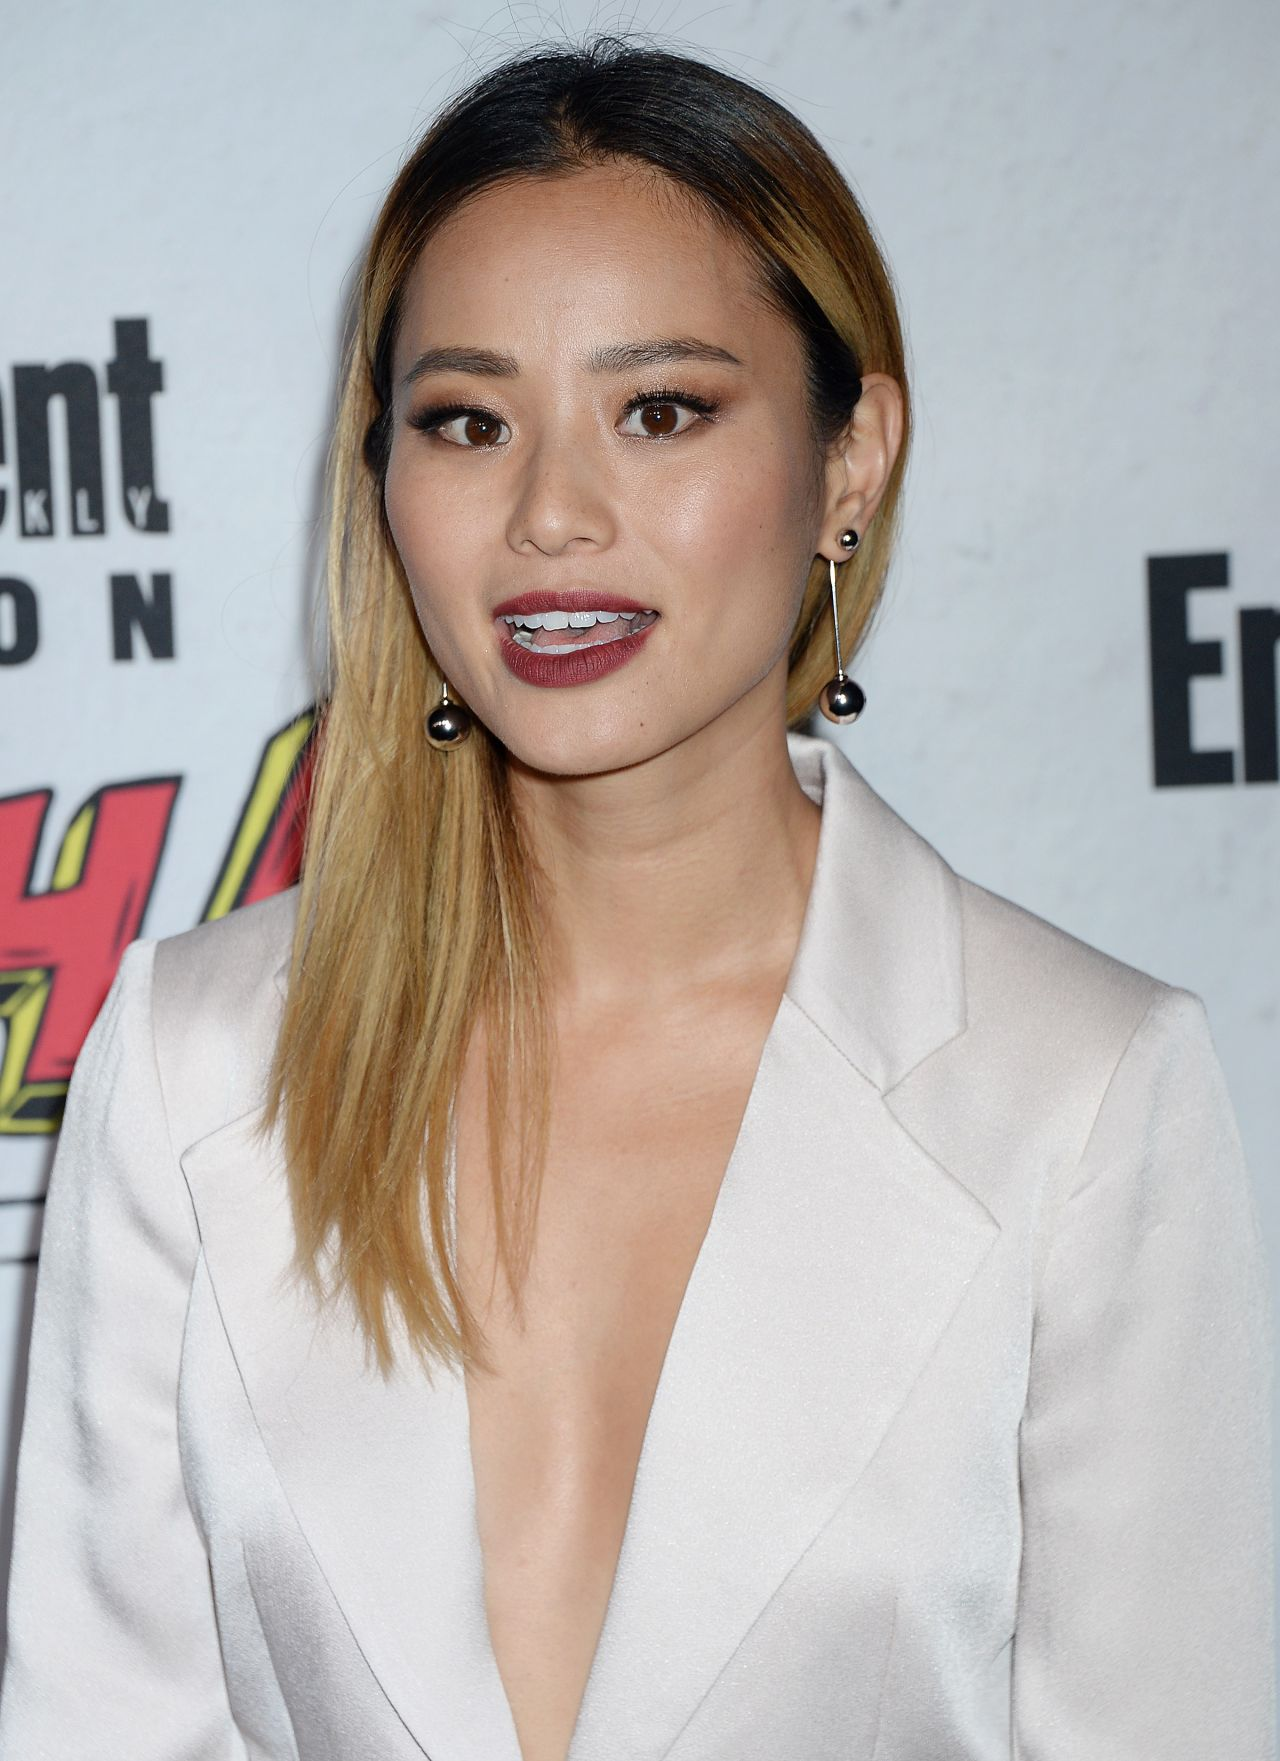 Jamie Chung Ew Party At San Diego Comic Con 07 22 2017